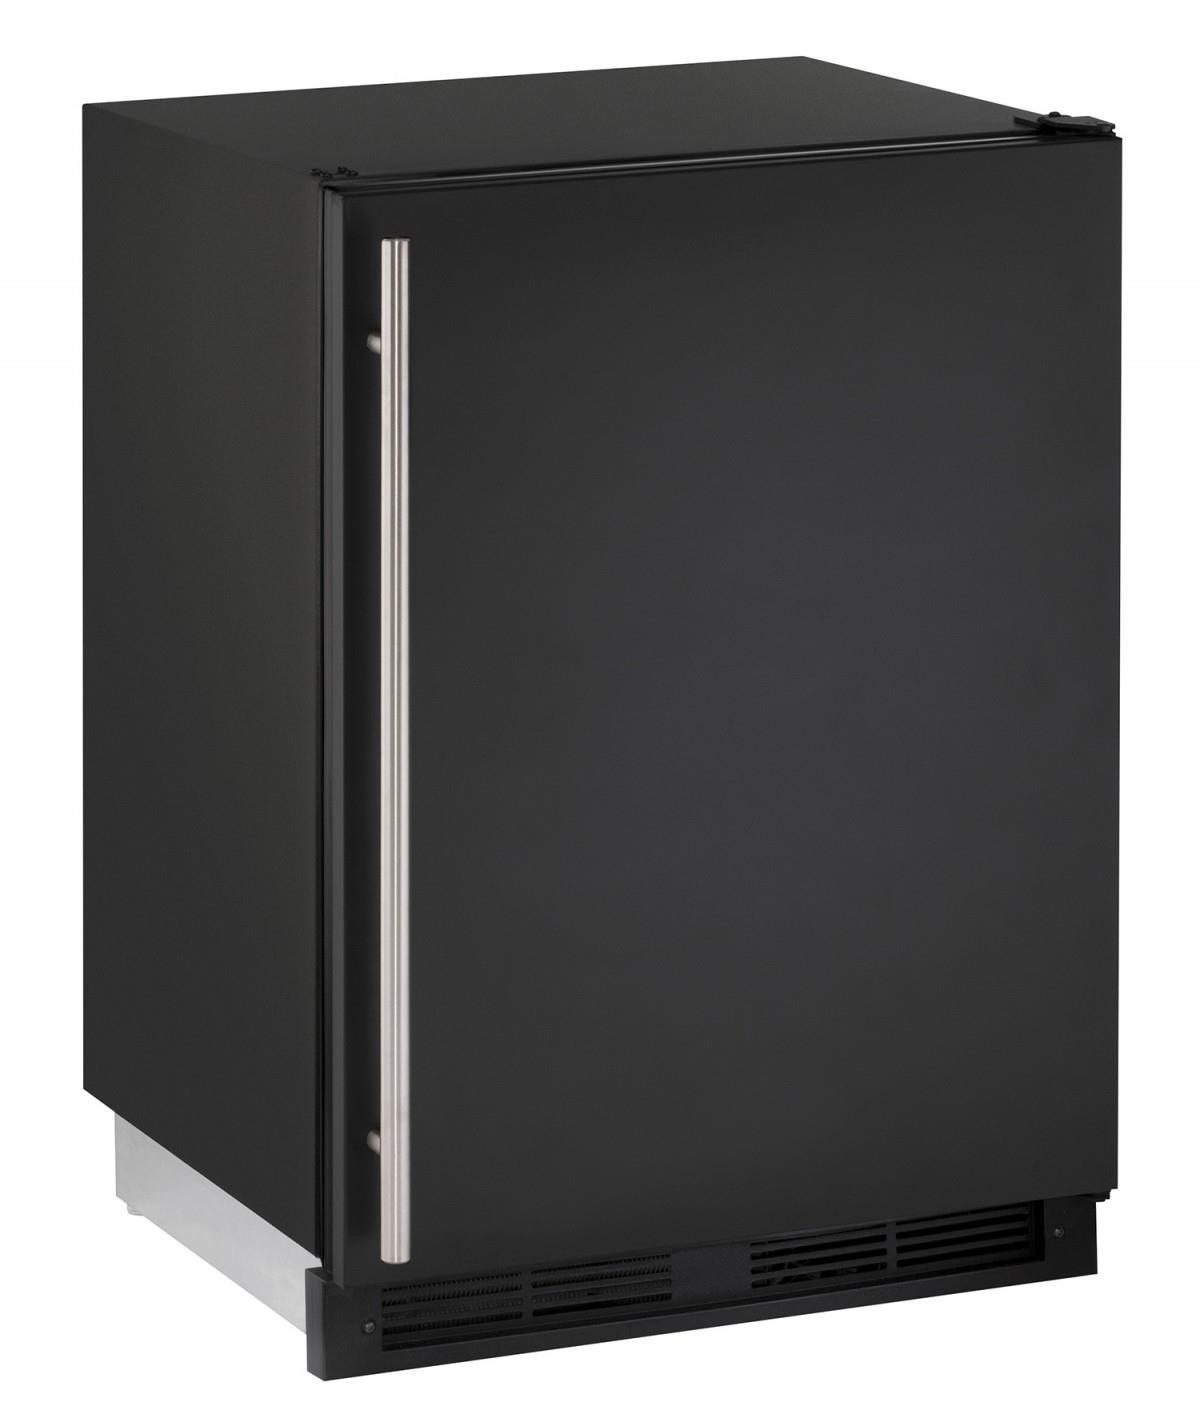 U-Line Refrigerators 4.2 cu. ft. Compact Refrigerator - Item Number: U-1224RFB-00A